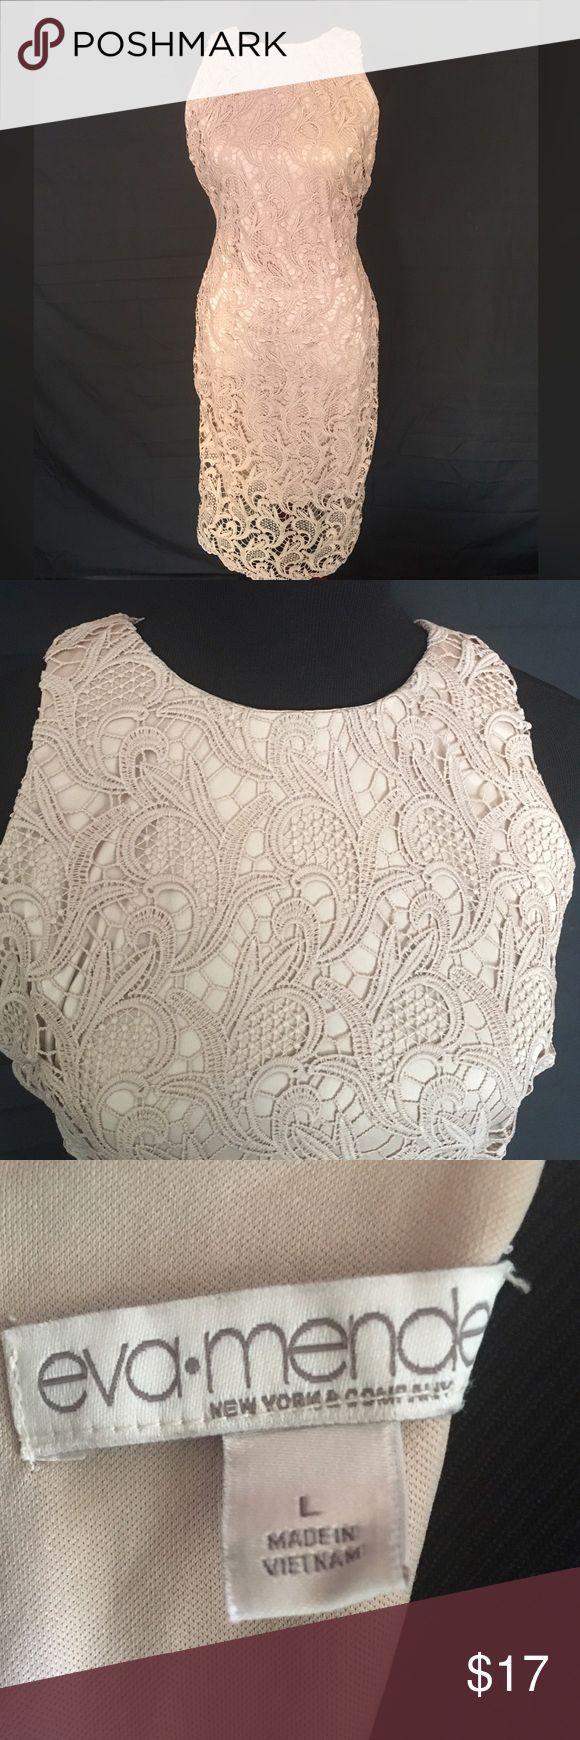 Eva Mendes Lace Dress Almost new , Eva Mendes Tan Lace Dress. Size Large. Beautiful lace details. New York & Company Dresses Midi